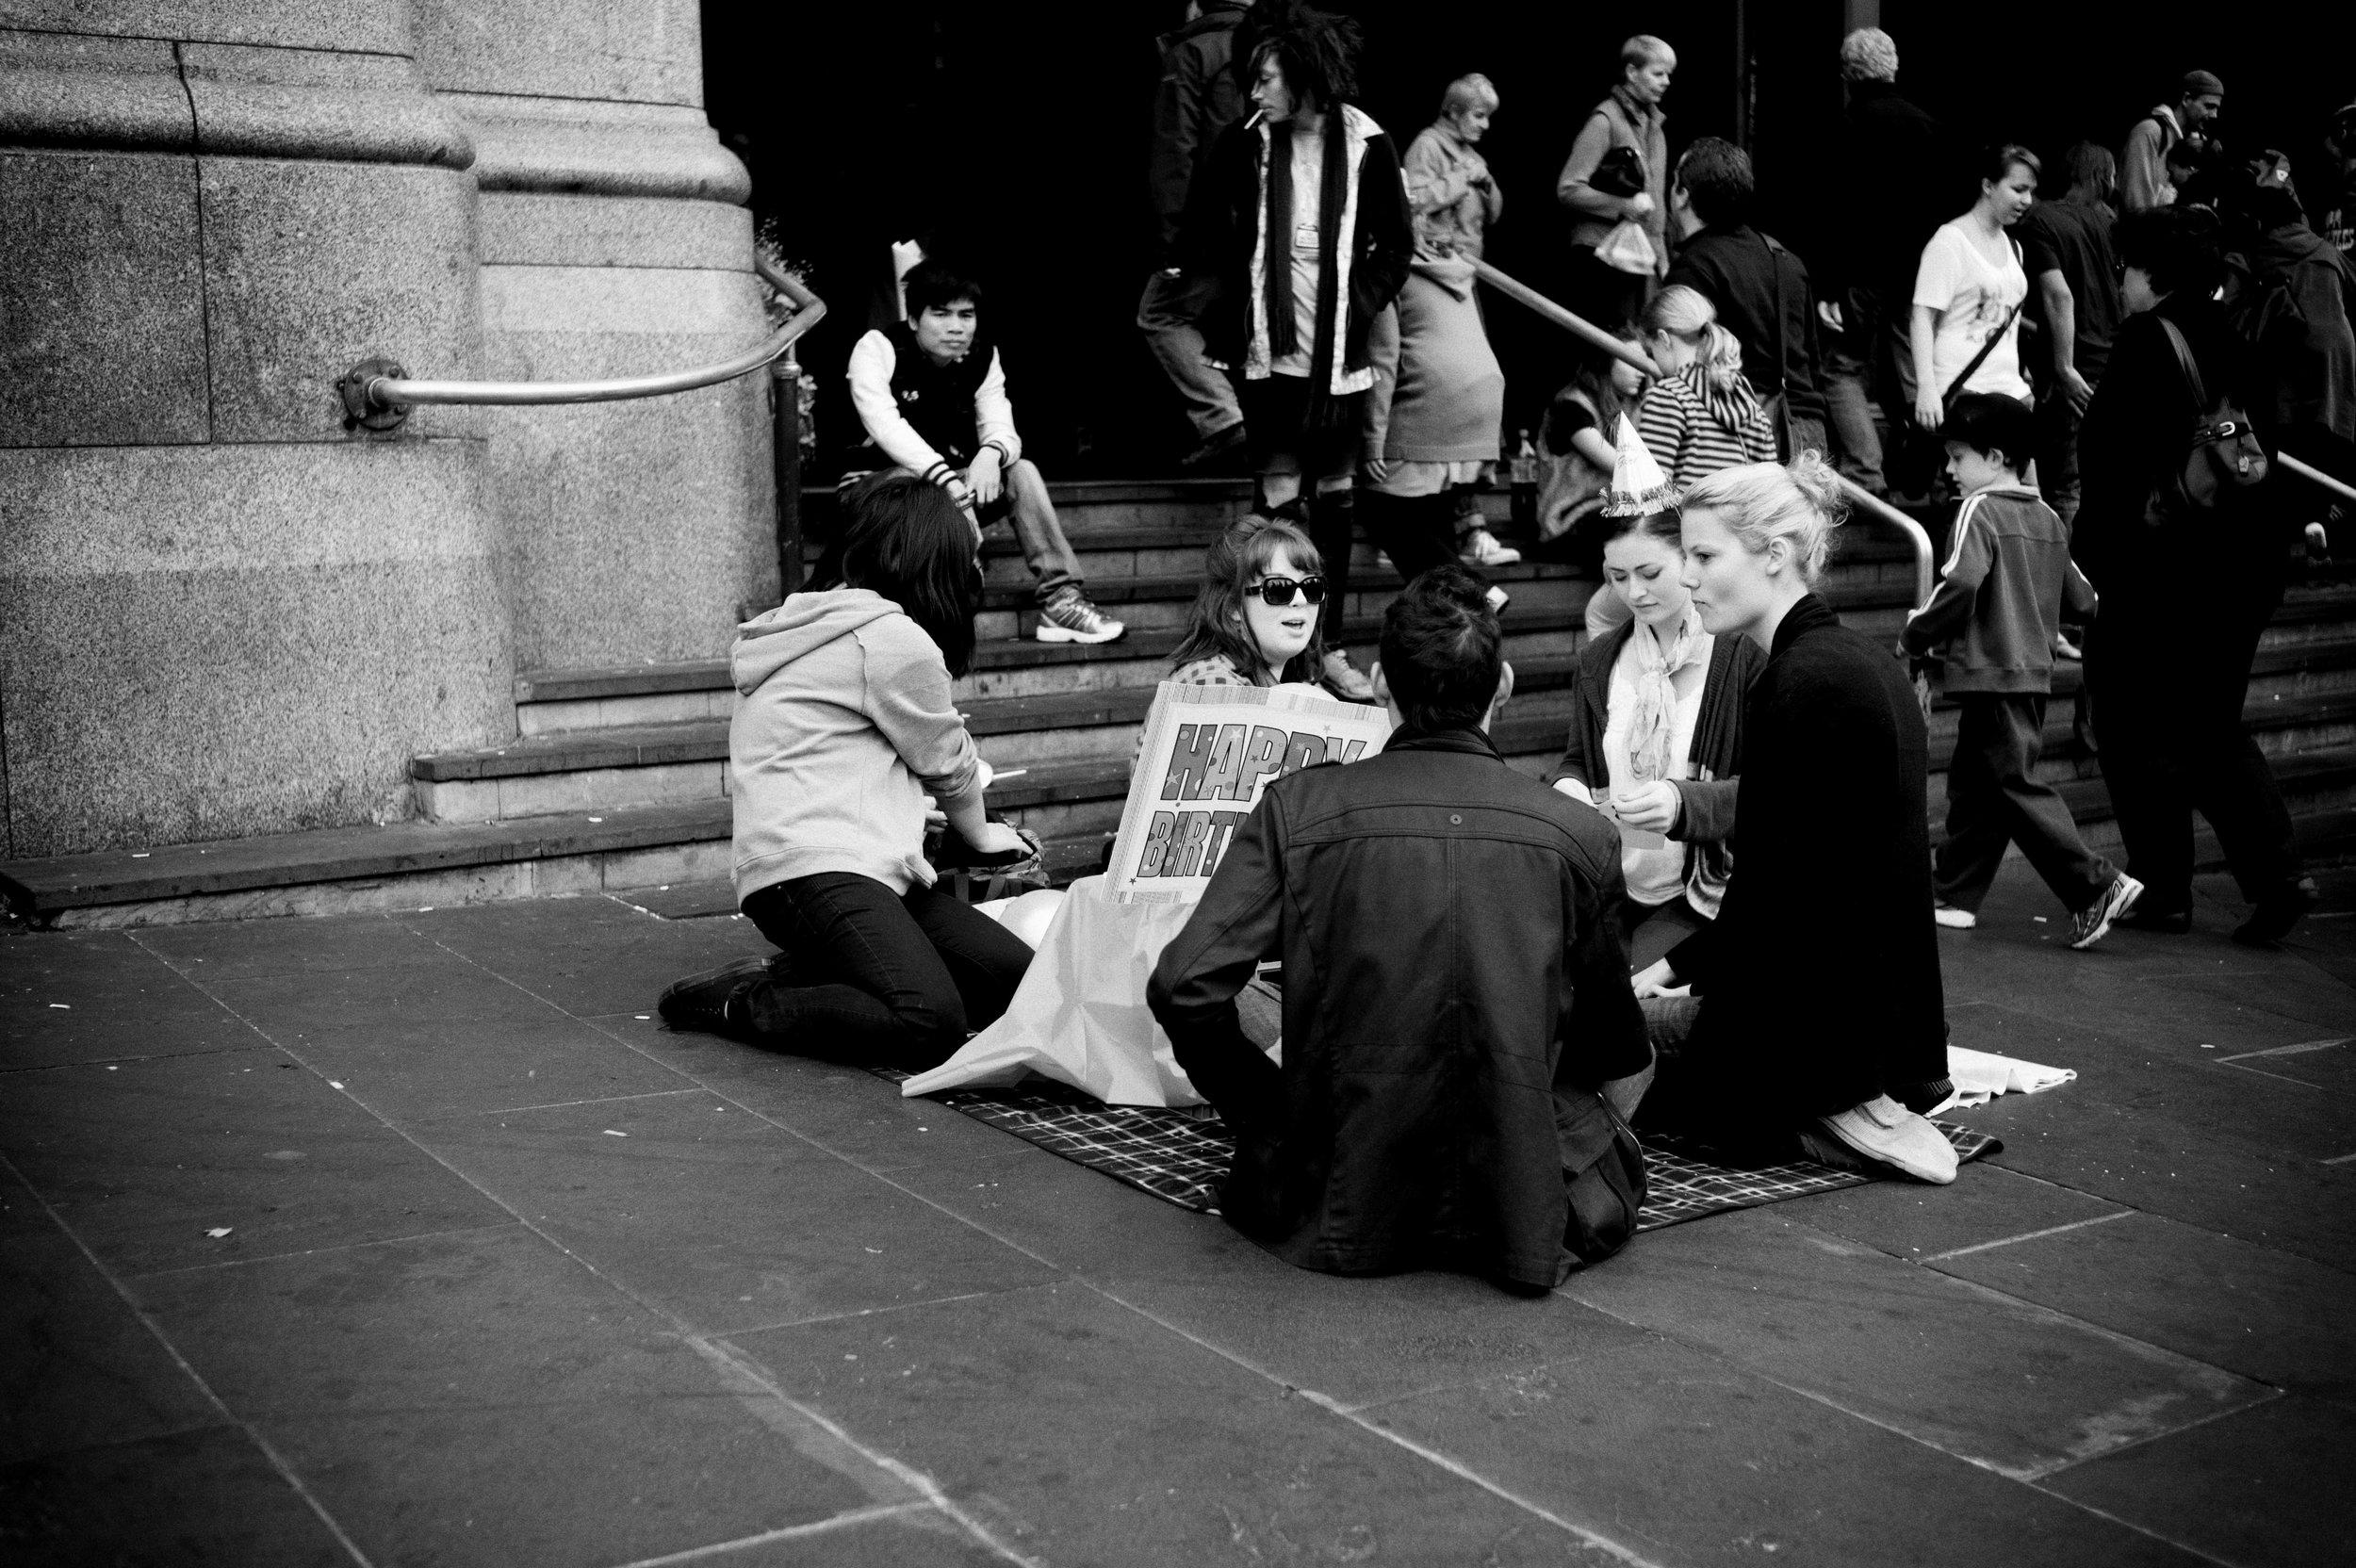 James Liu, 'Birthday', Flickr, Creative Commons